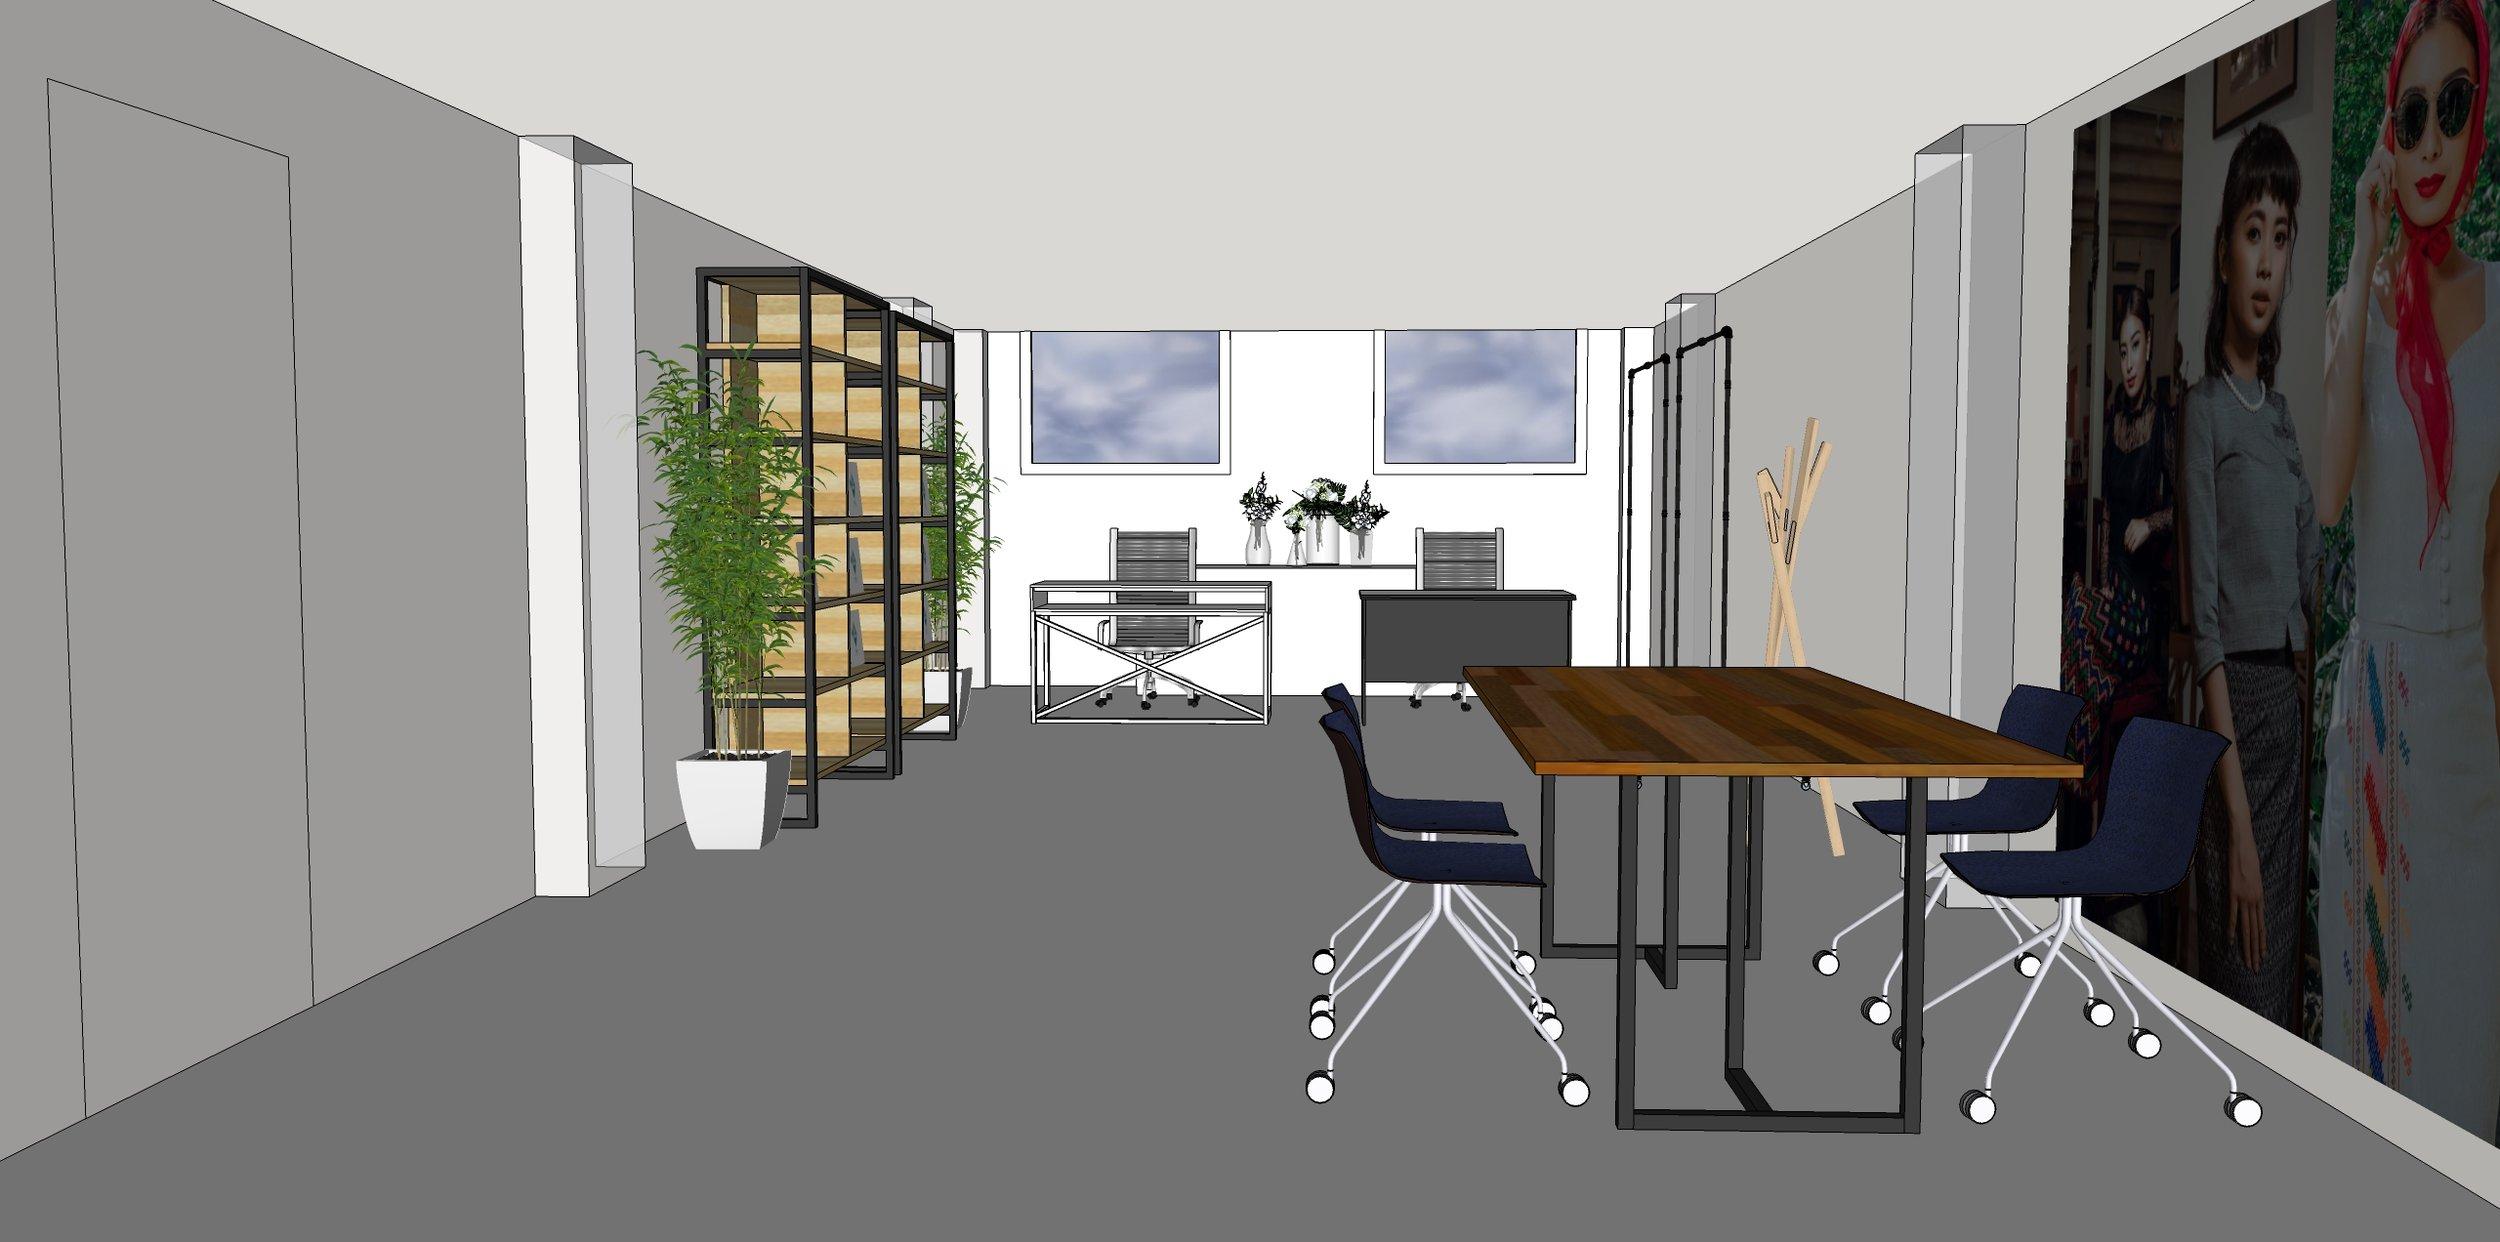 Floor Plan_Residential Basement of RIDA_side view.jpg